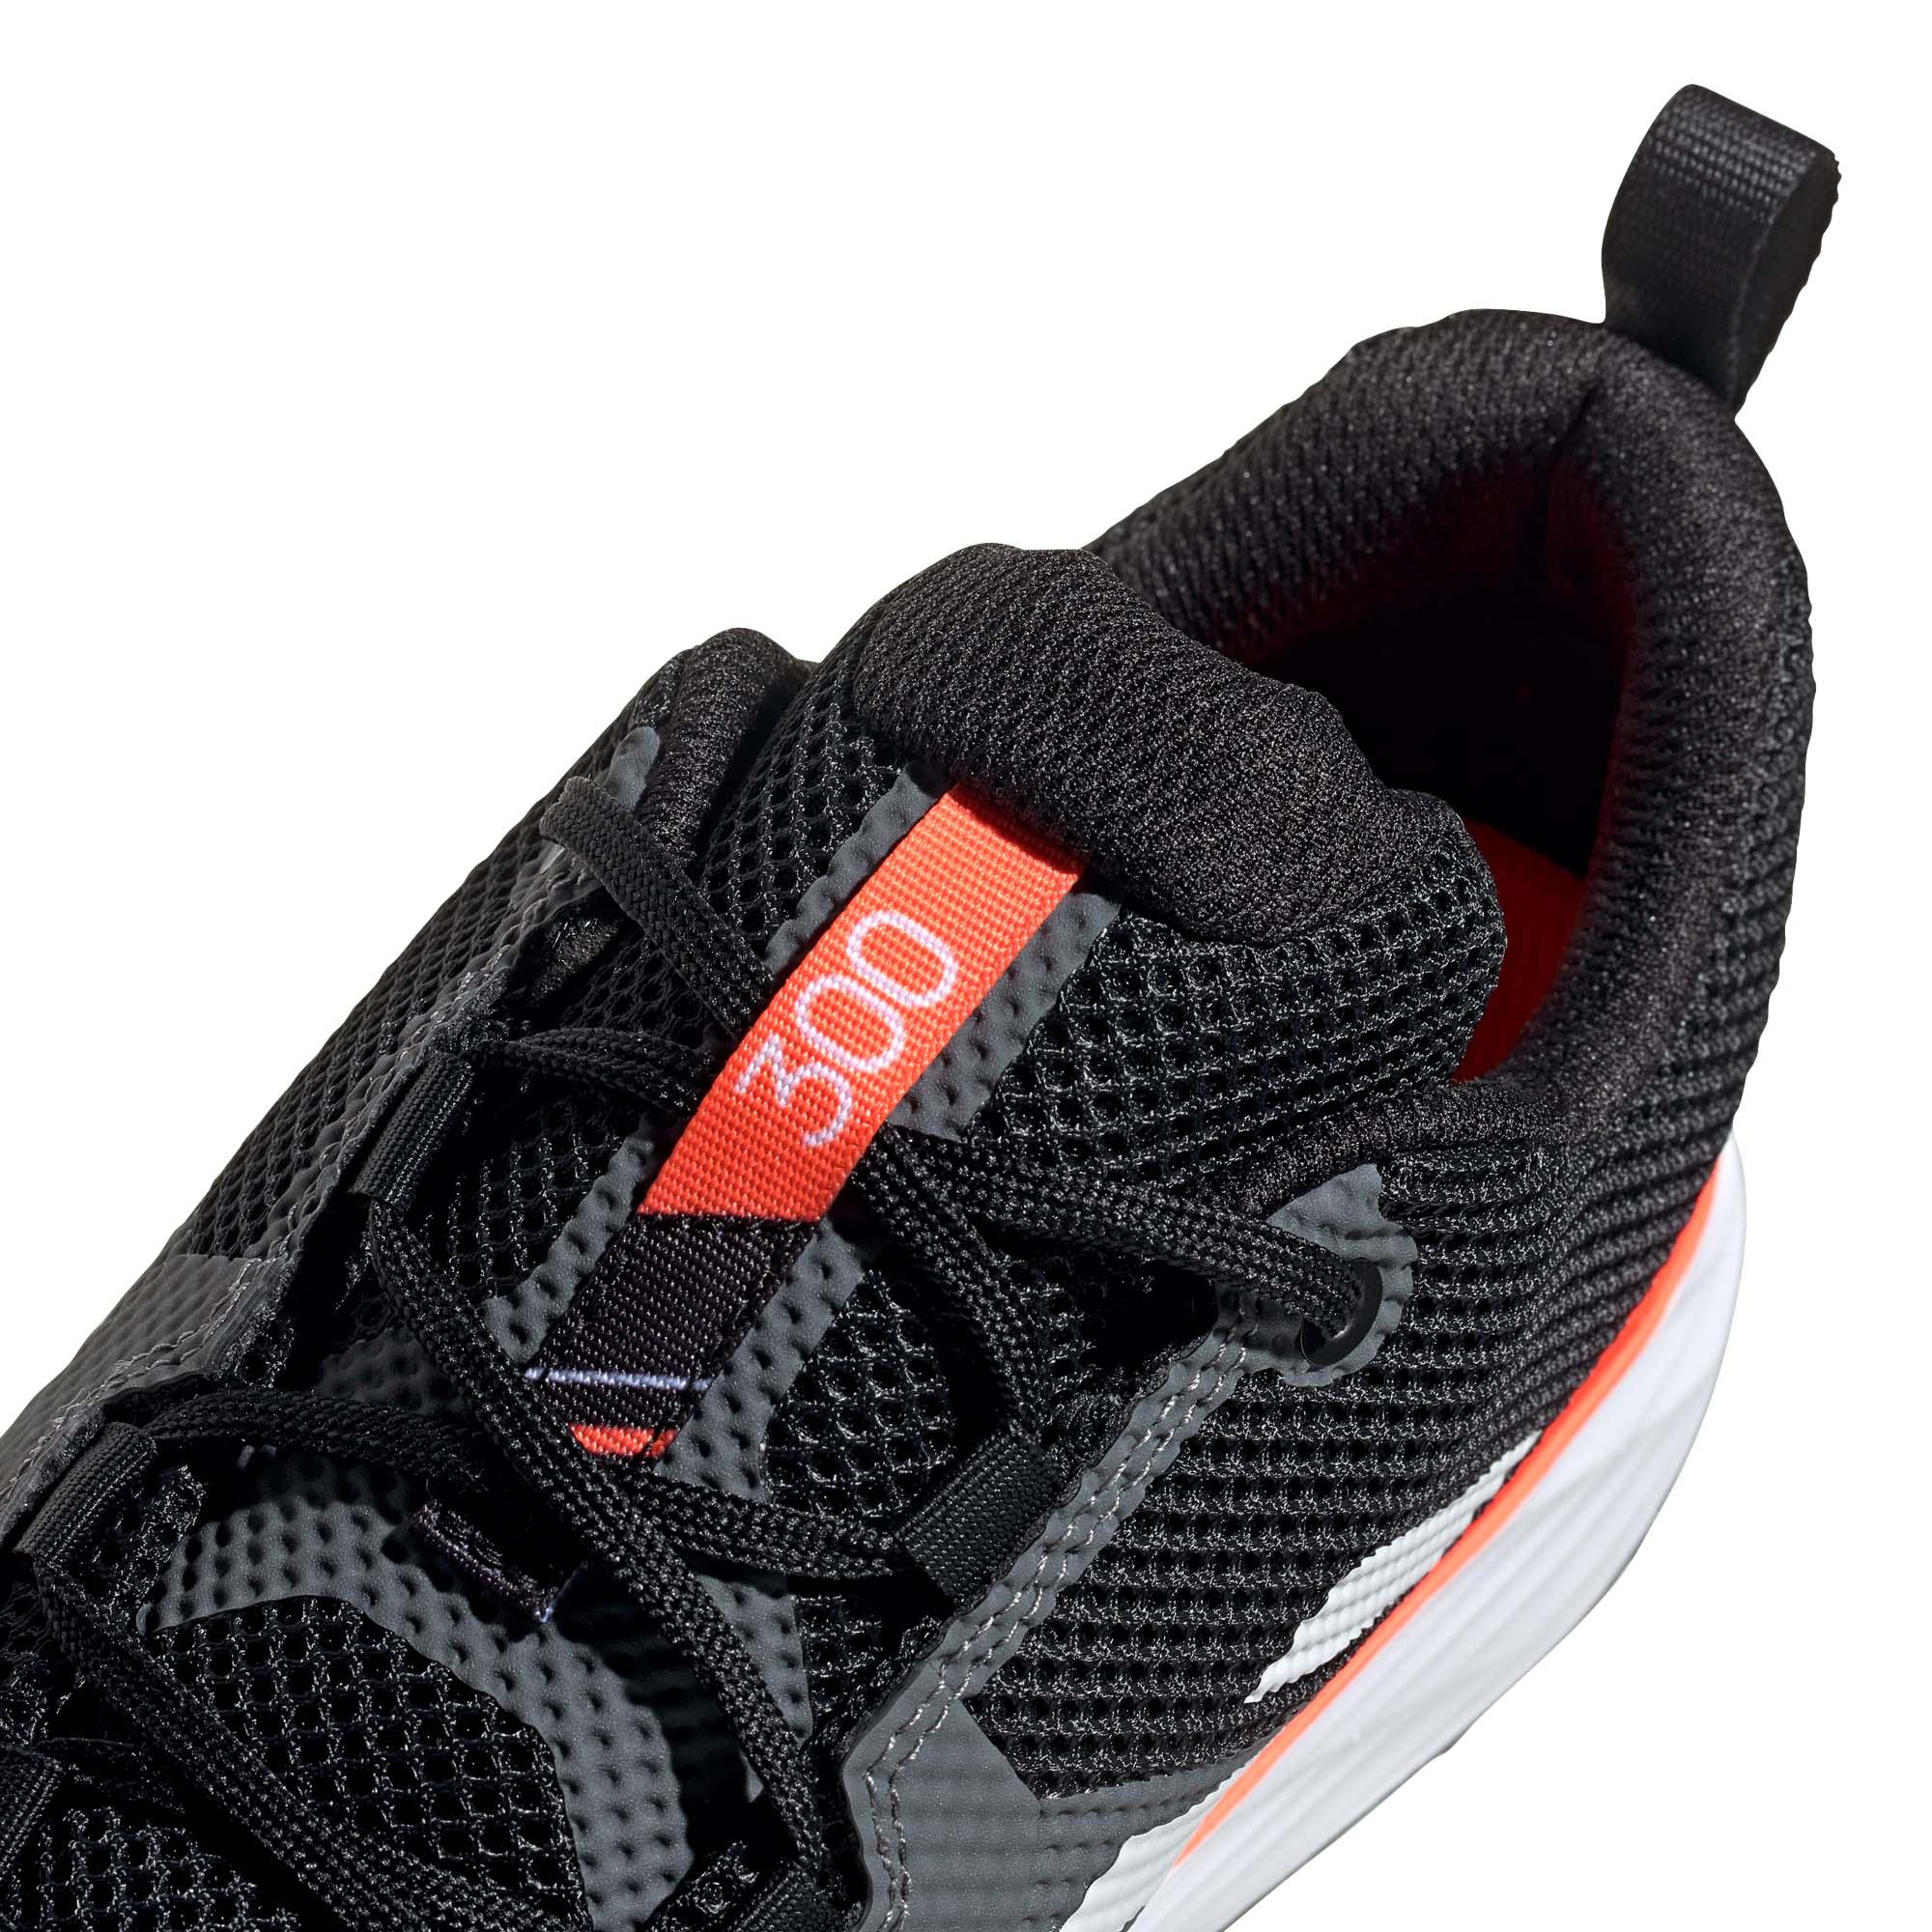 miniatura 9 - ADIDAS Terrex Due Da Uomo Scarpa Trail Running Scarpe da ginnastica nero/bianco/rosso